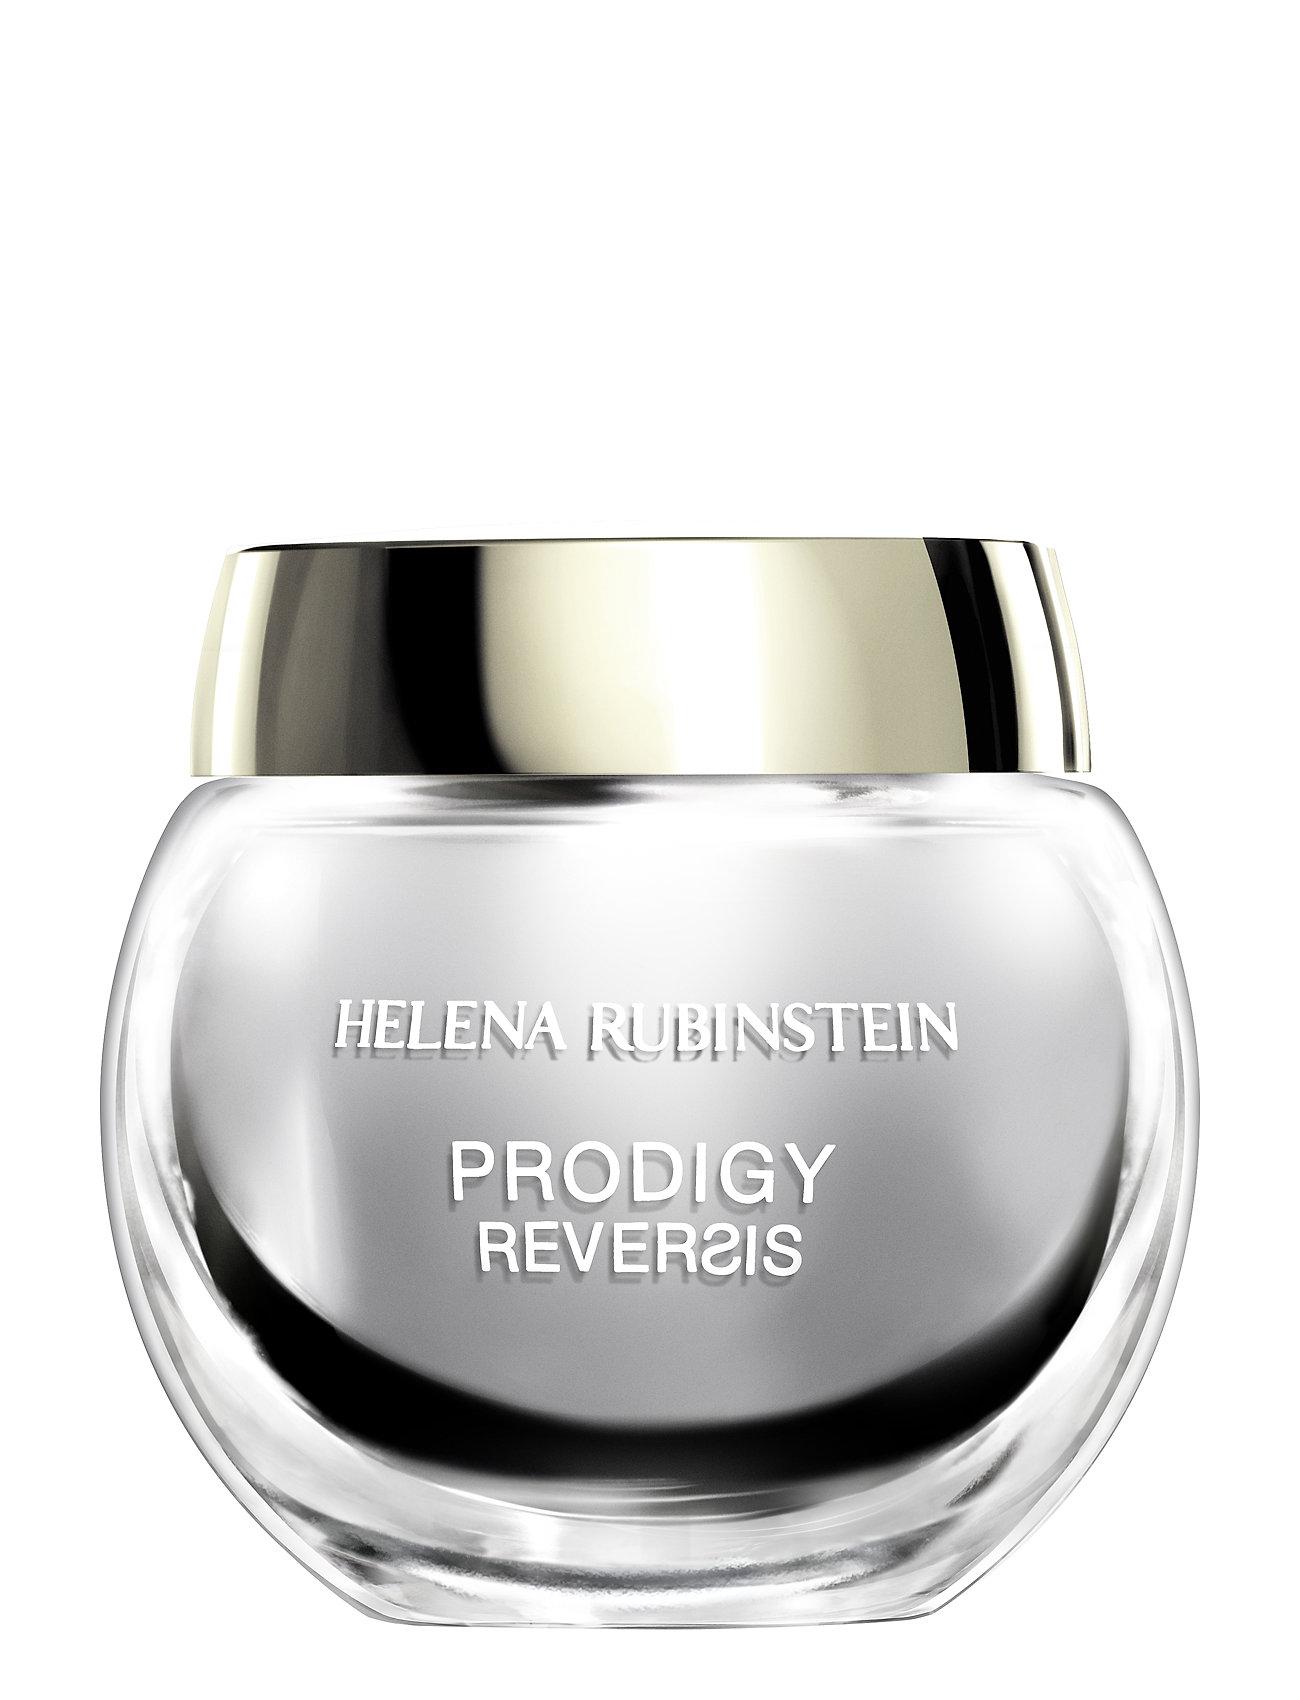 helena rubinstein – Prodigy reversis creme normal skin 50 ml fra boozt.com dk